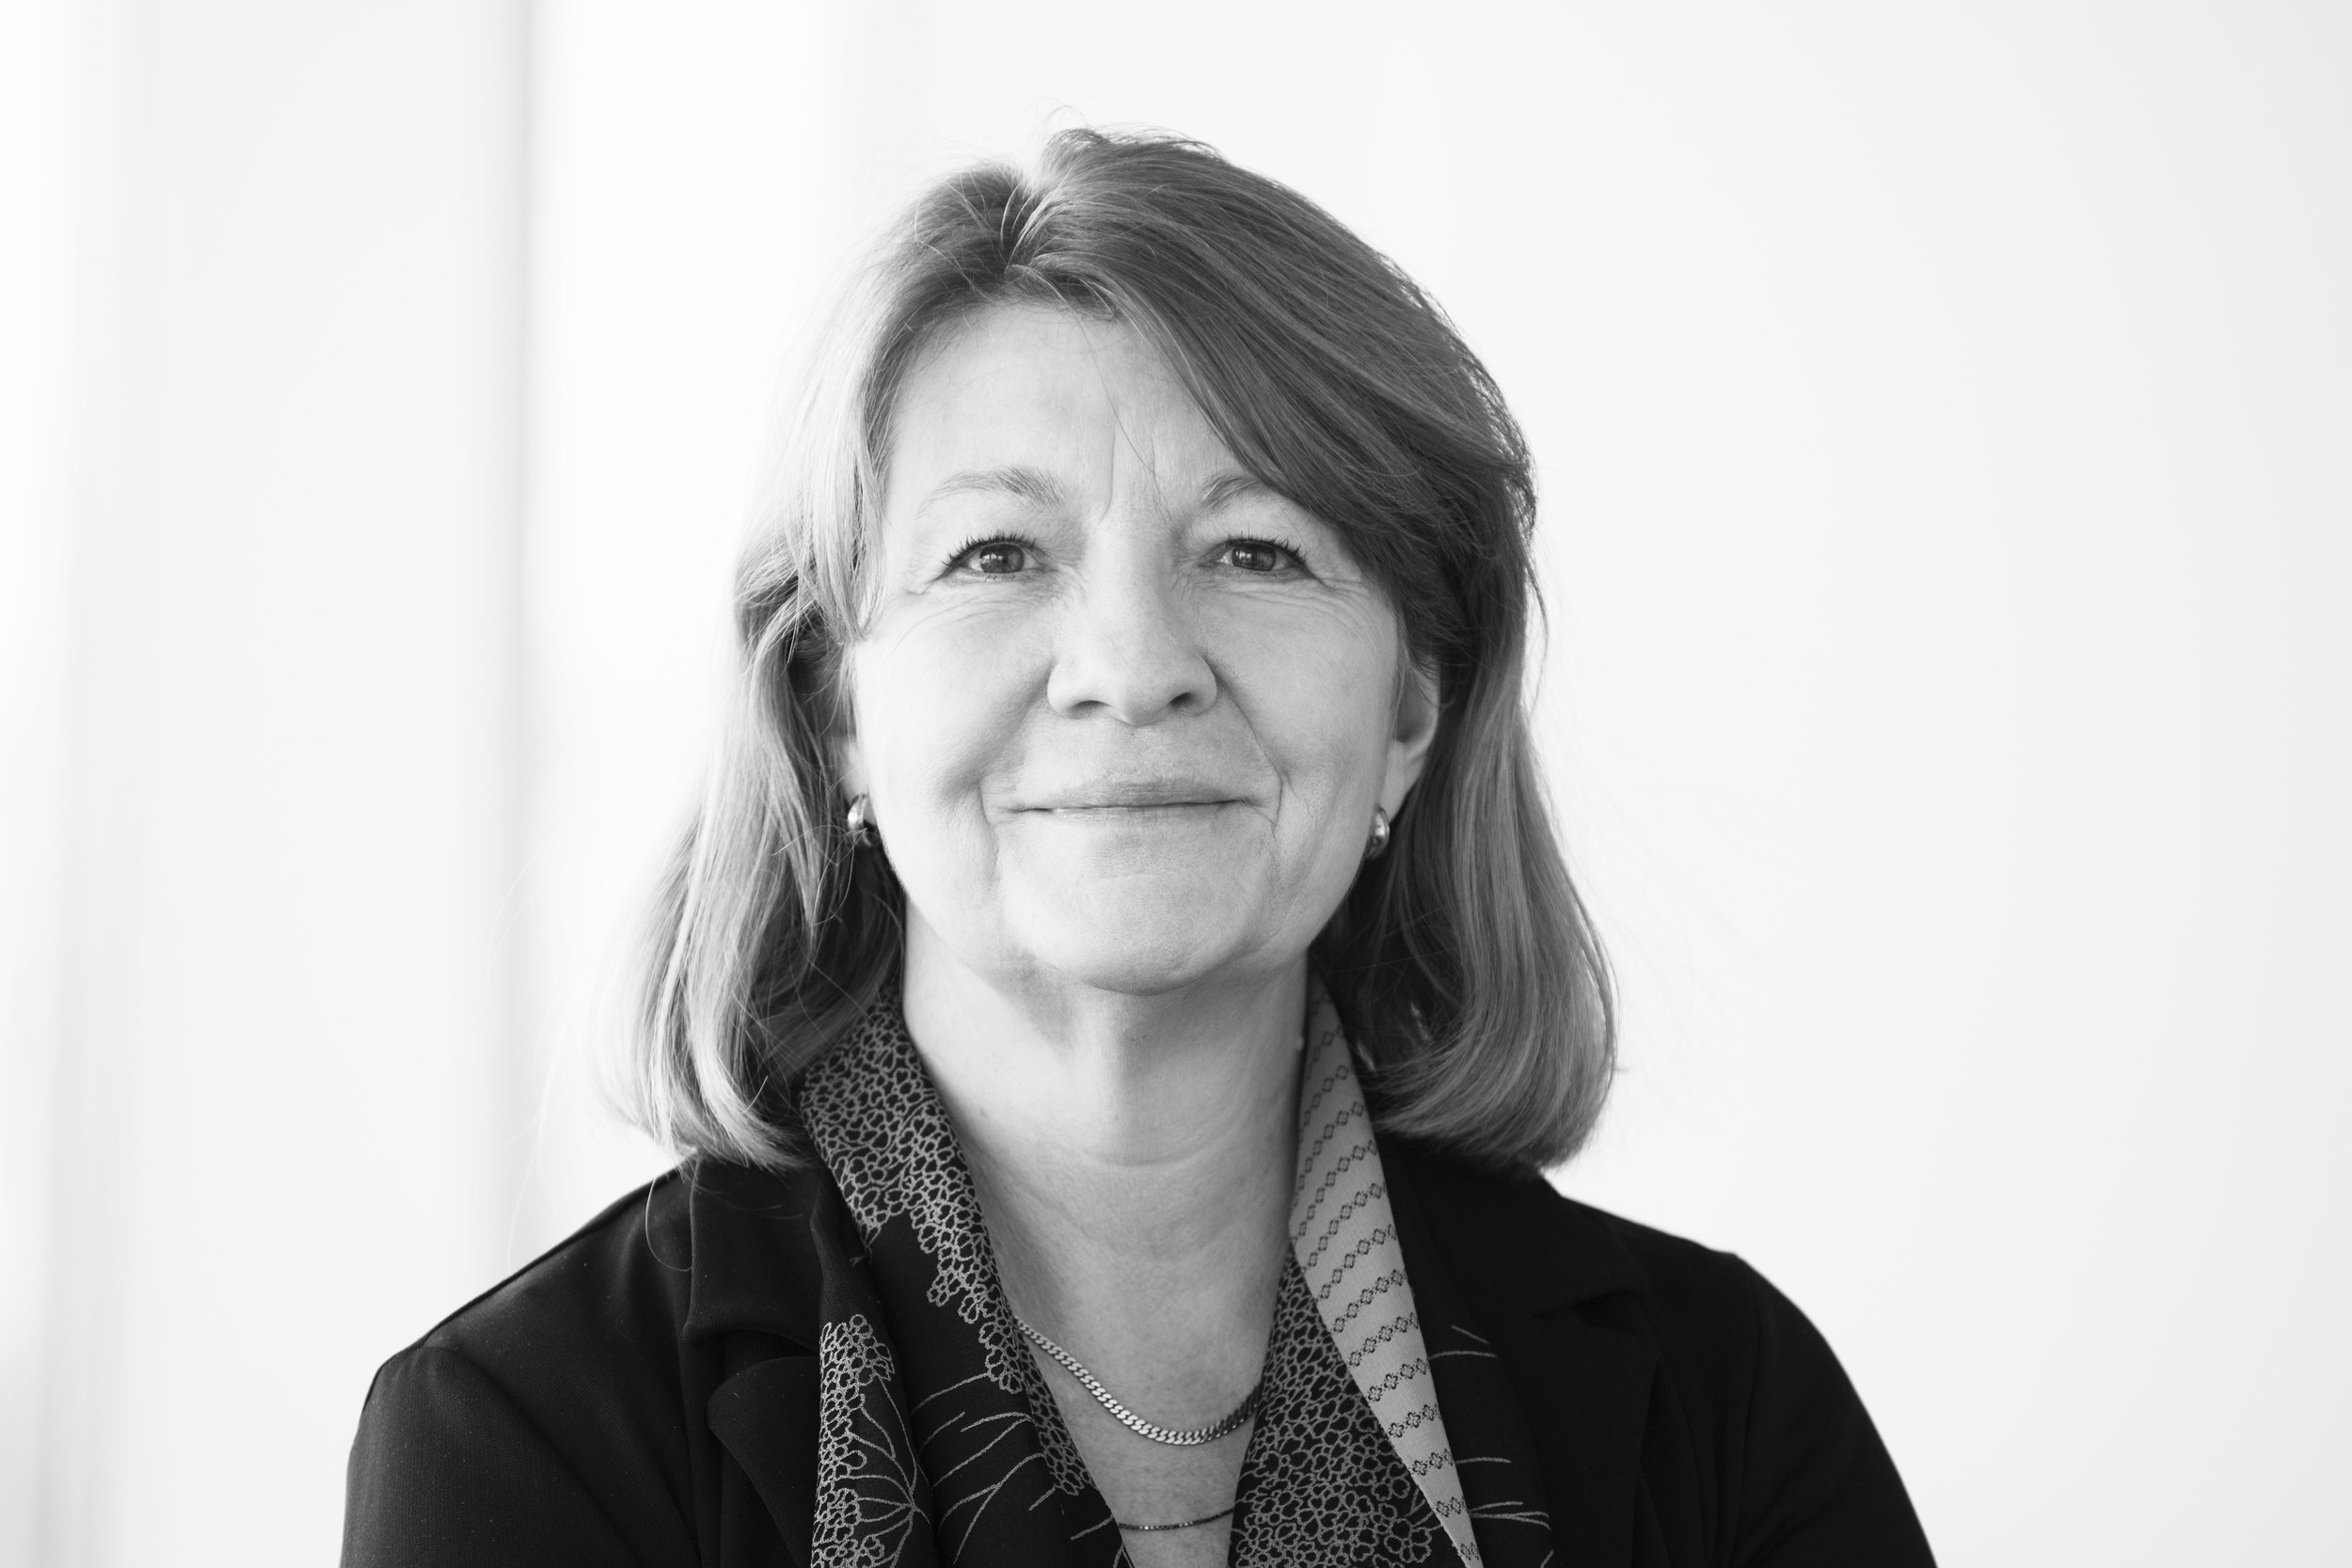 Ann Johansson - Business AssistantLång erfarenhet från professional services. Tidigare McKinsey, White & Case, and Odgers Berndtson mm. Läs mer →+46 (0)70 493 64 54ann.johansson@nordicinterim.com